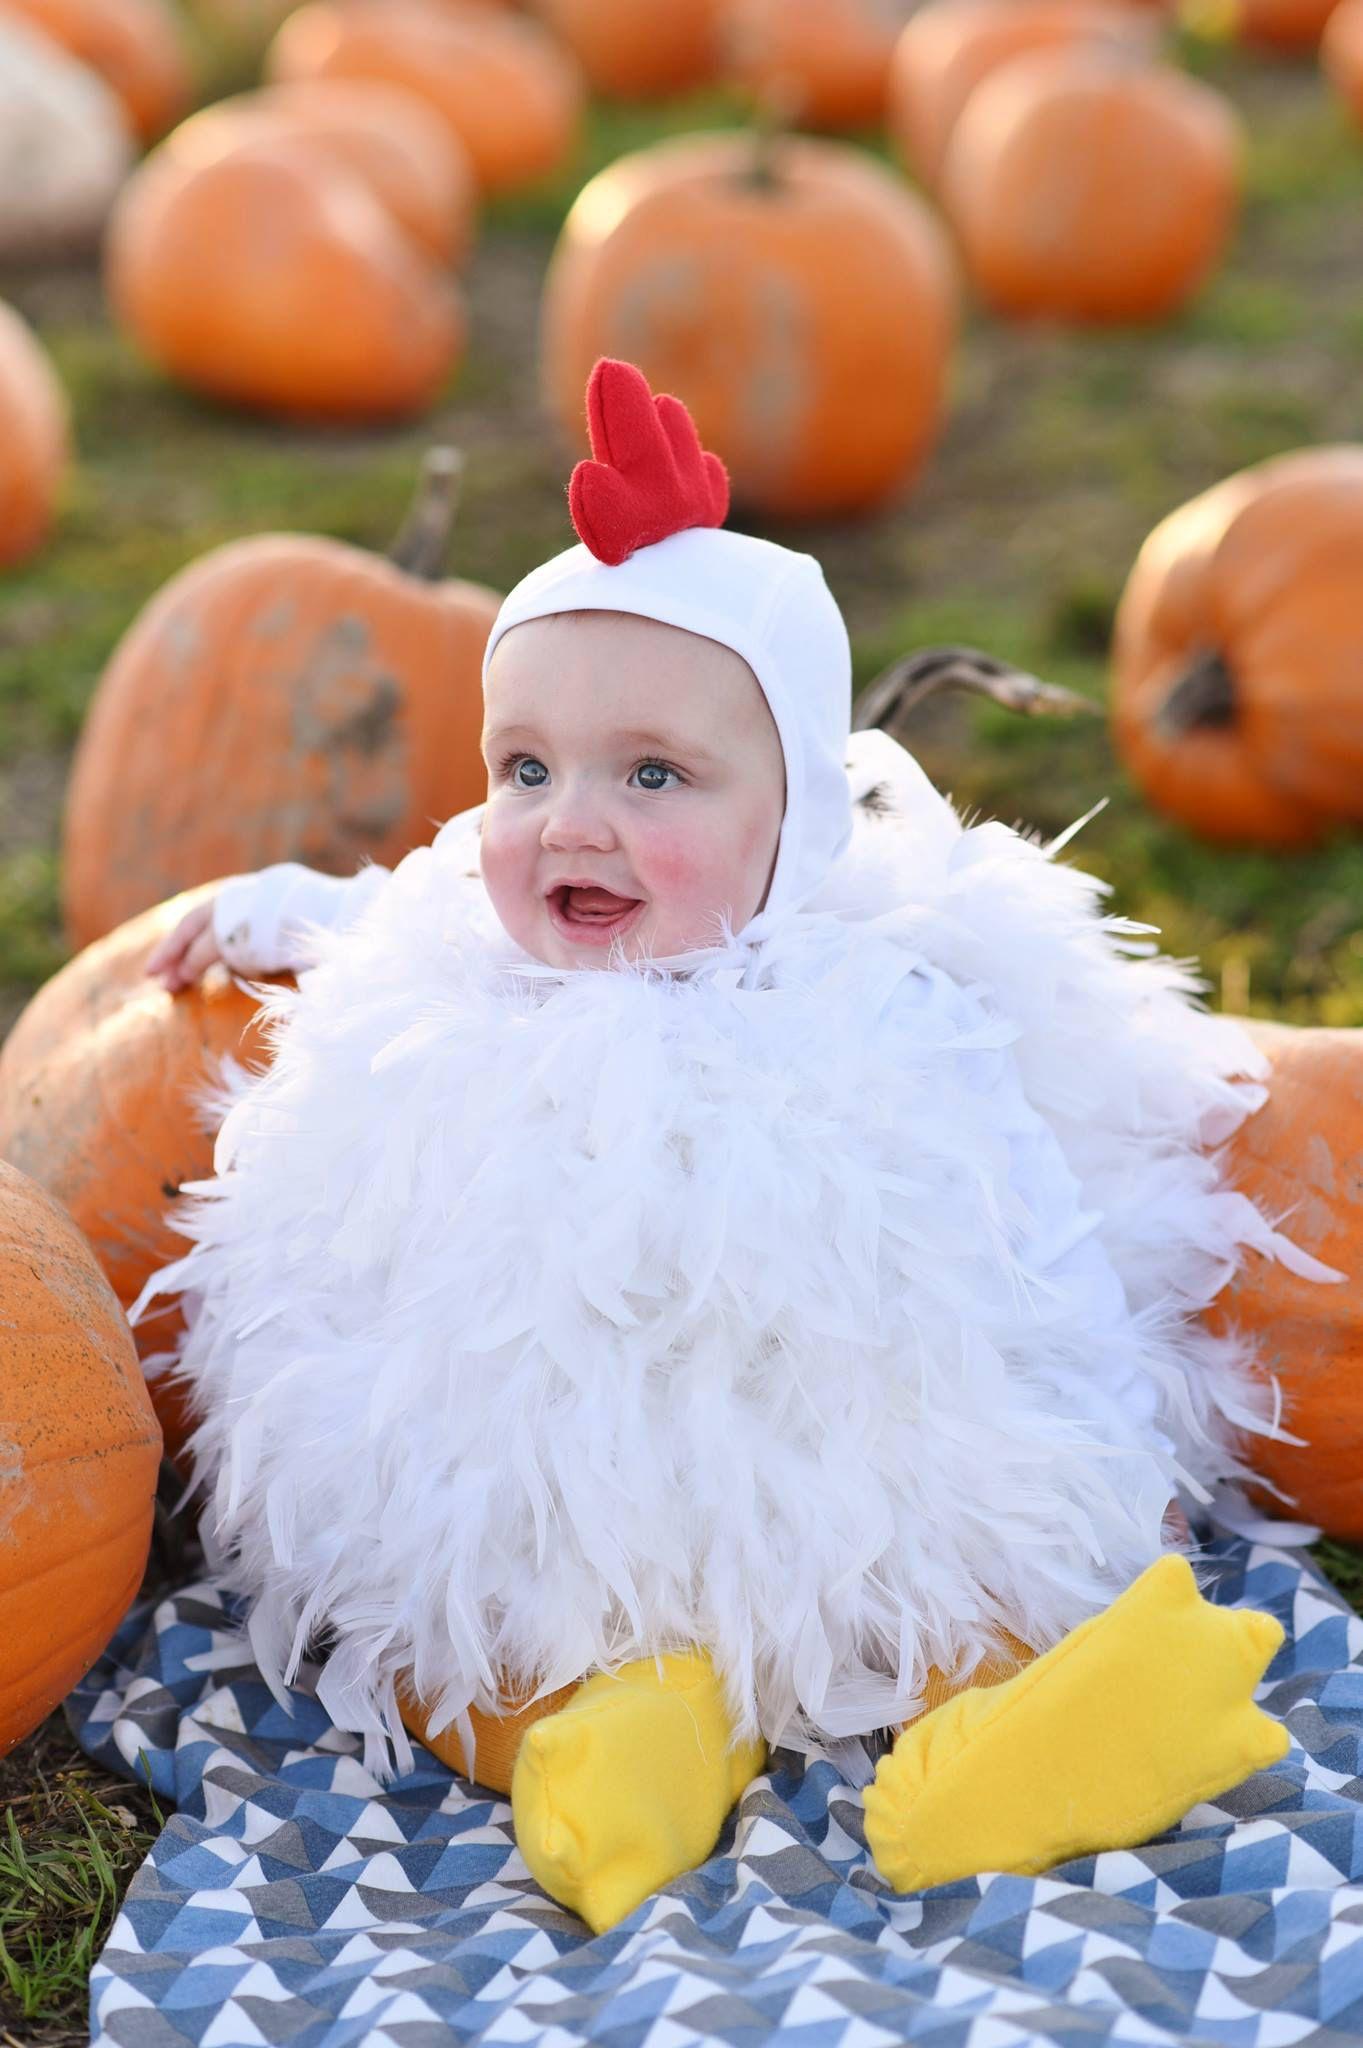 diy baby chicken halloween costume halloween pinterest baby chickens diy baby and. Black Bedroom Furniture Sets. Home Design Ideas